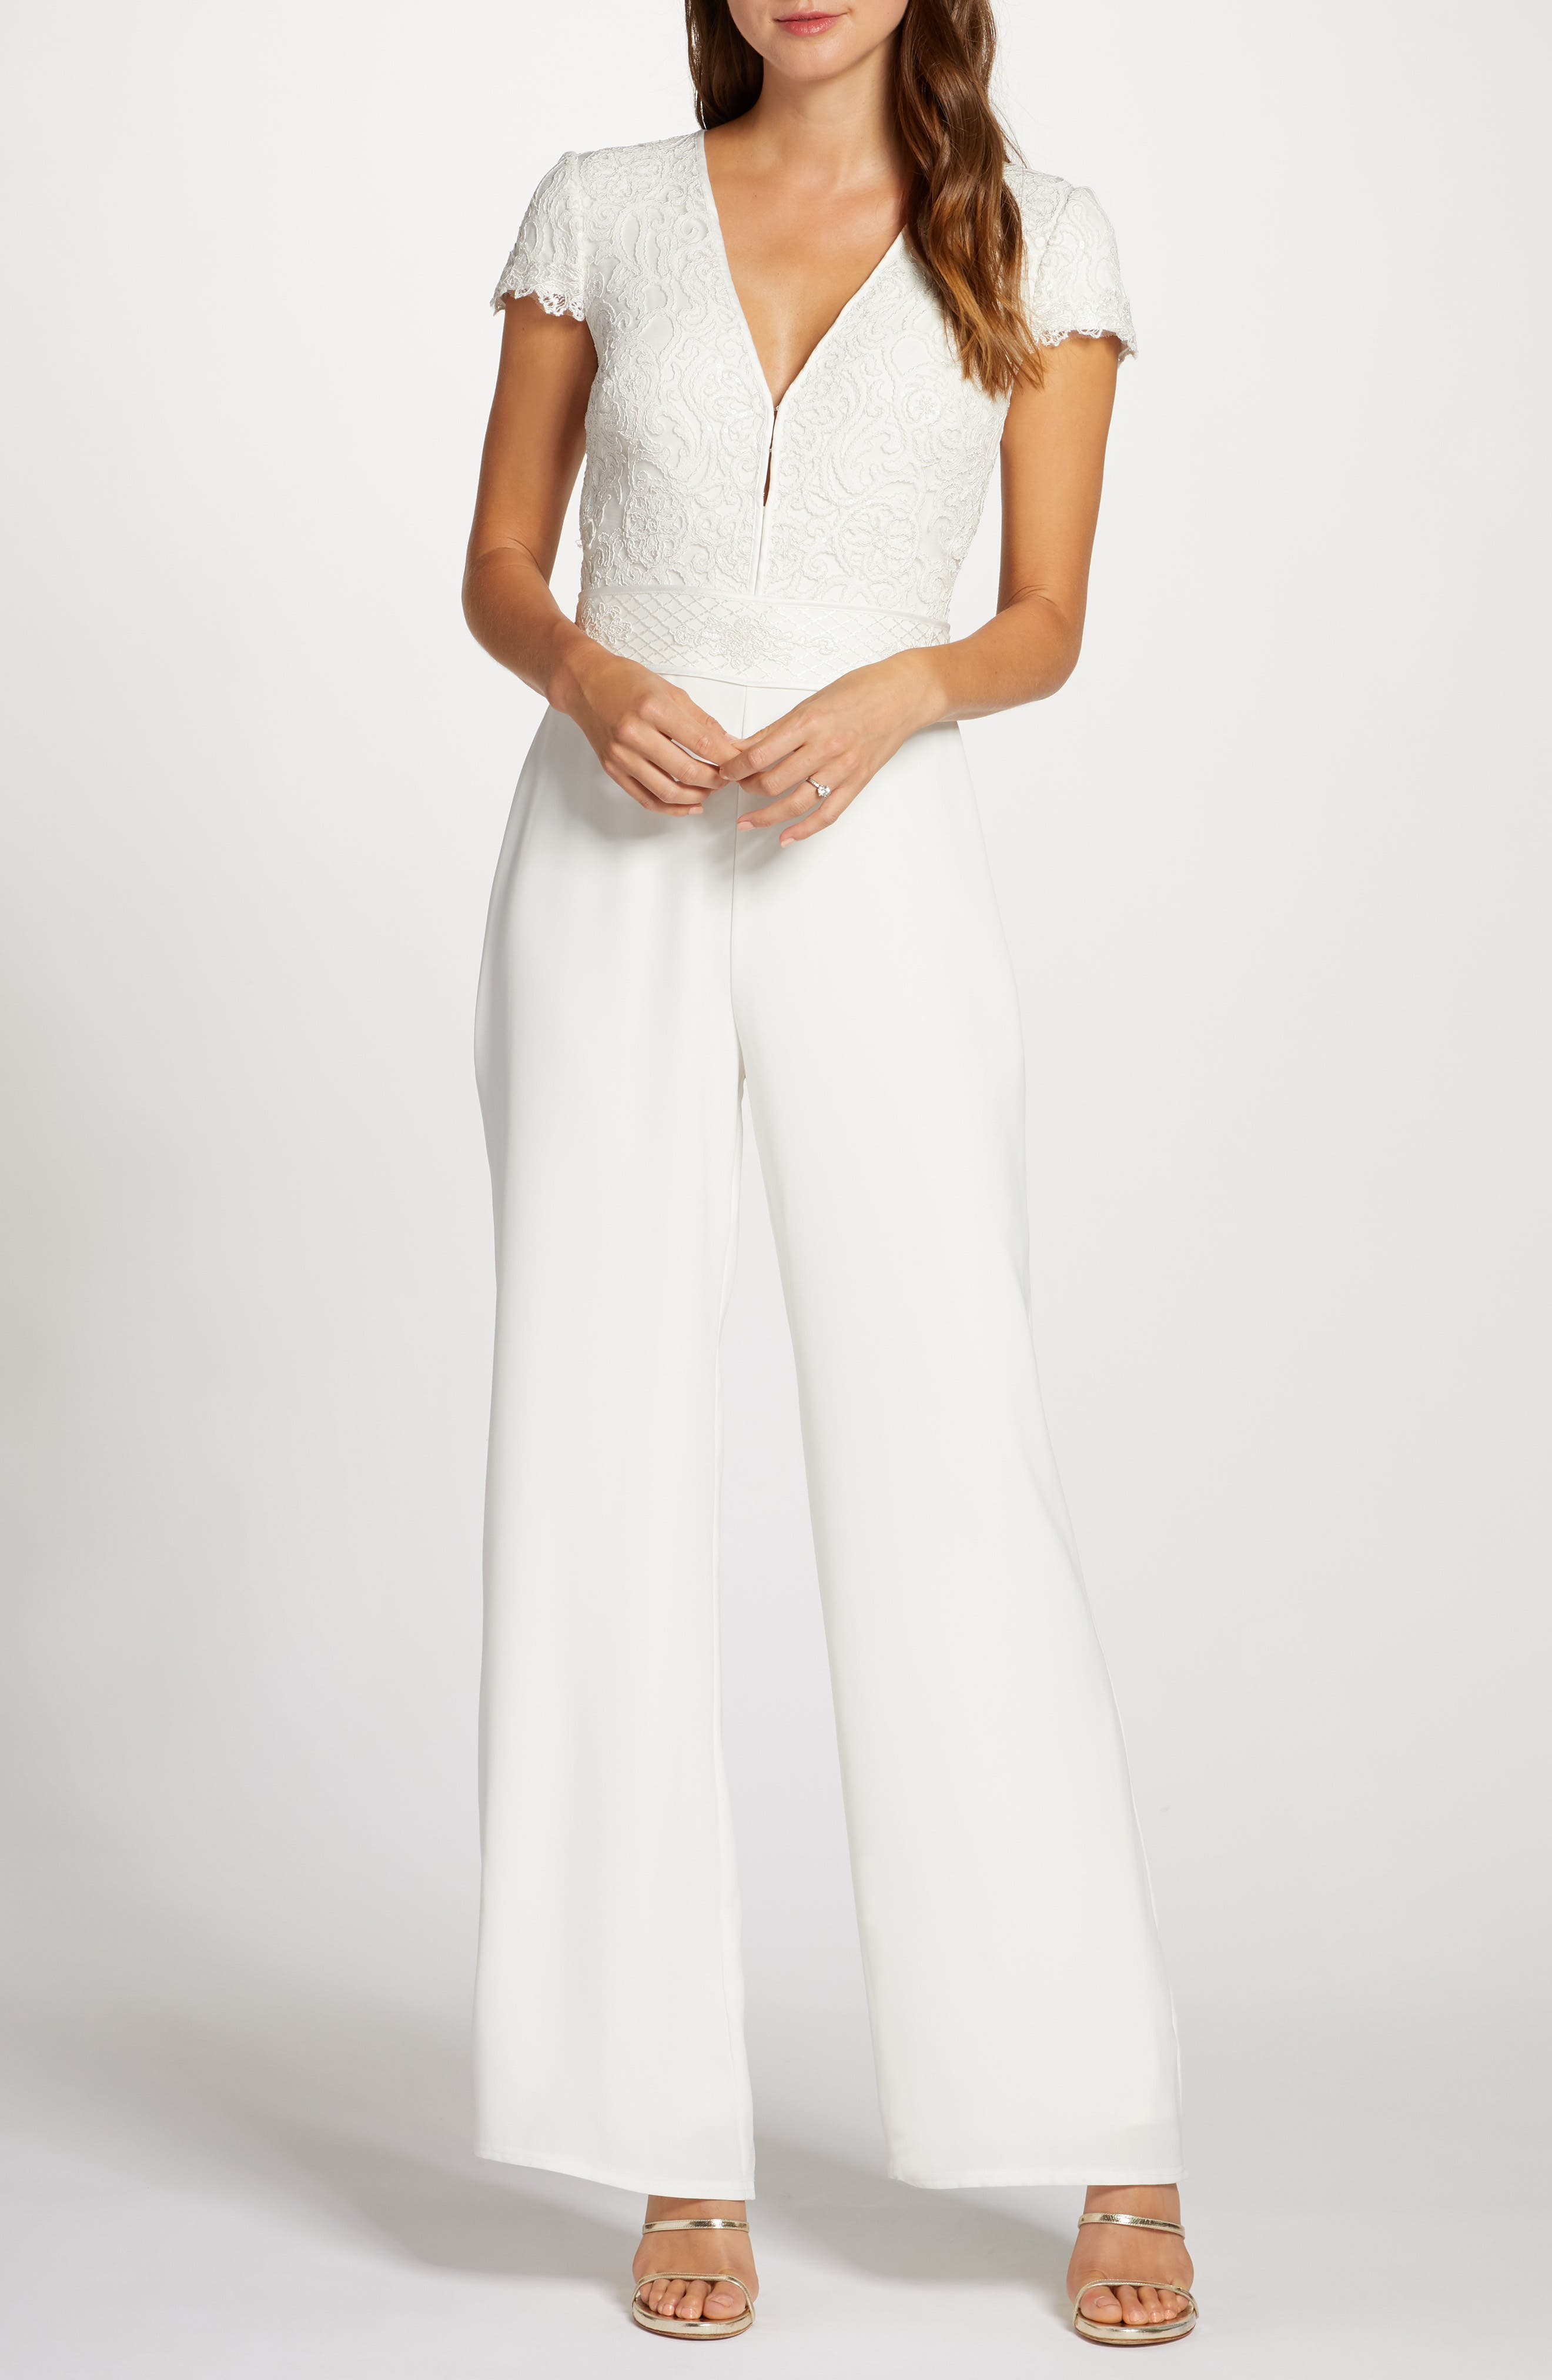 60s Wedding Dresses | 70s Wedding Dresses Womens Tadashi Shoji Lace Bodice Wide Leg Wedding Jumpsuit $498.00 AT vintagedancer.com